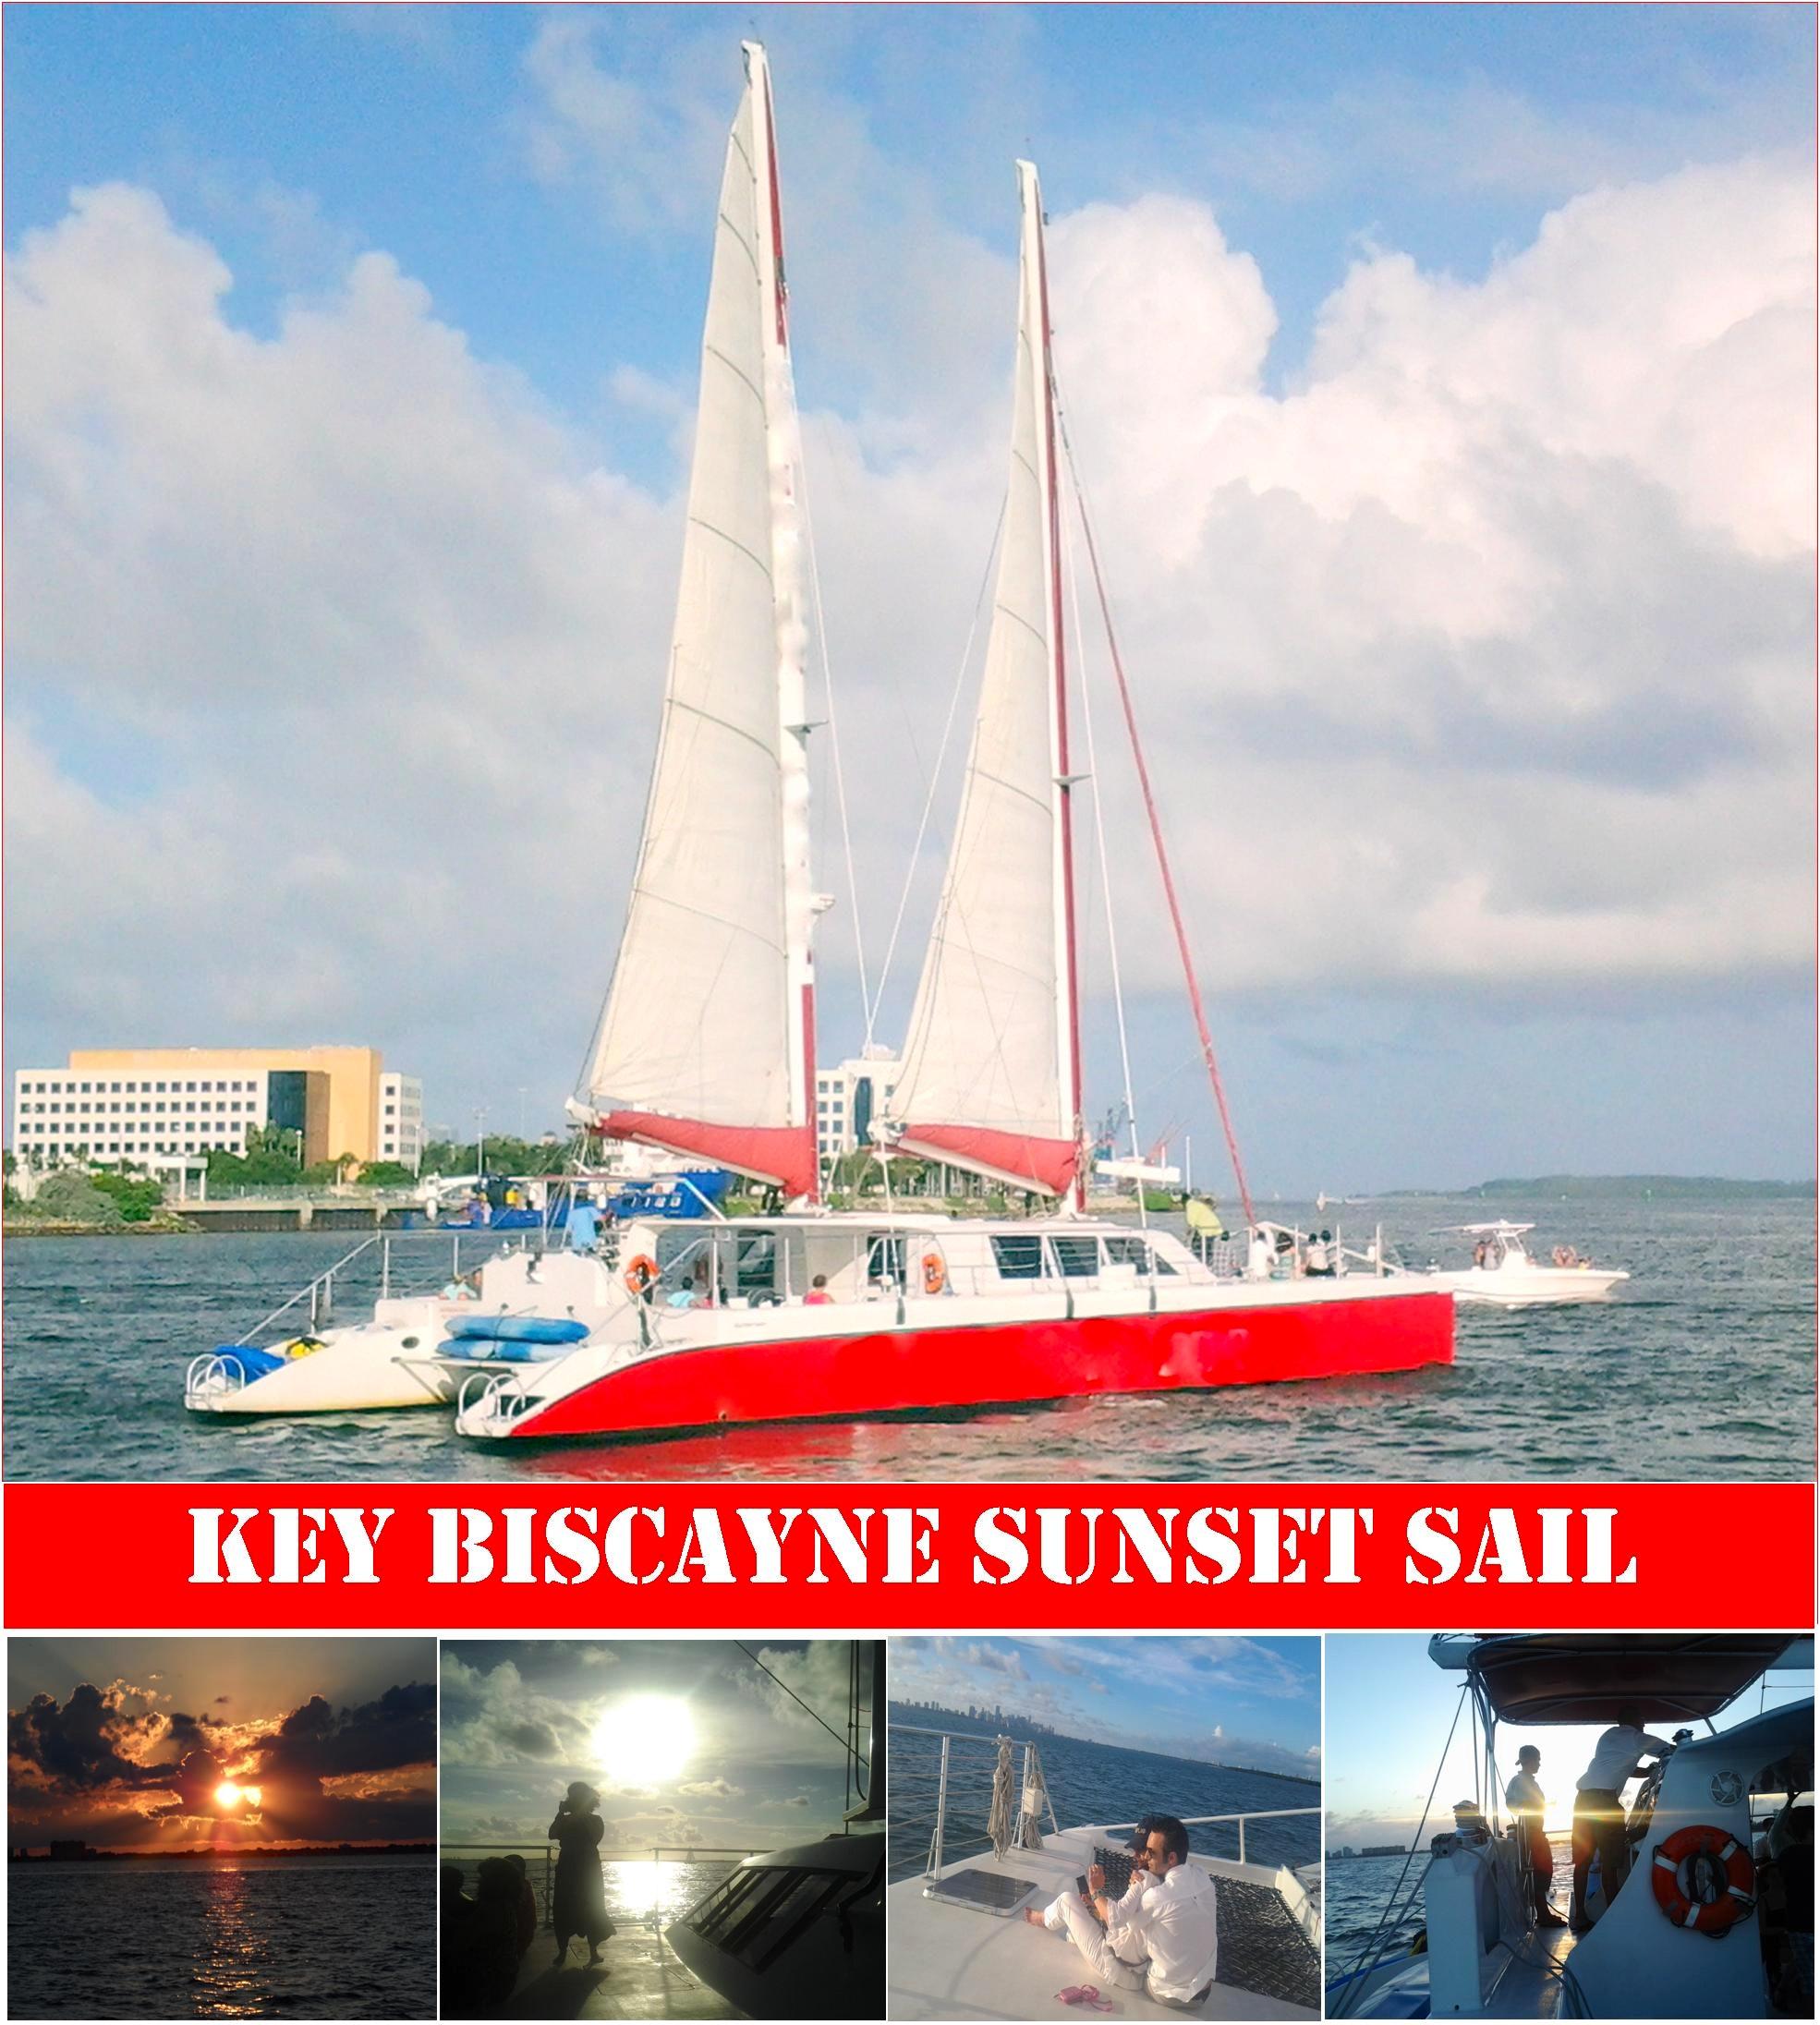 Key Biscayne Sunset